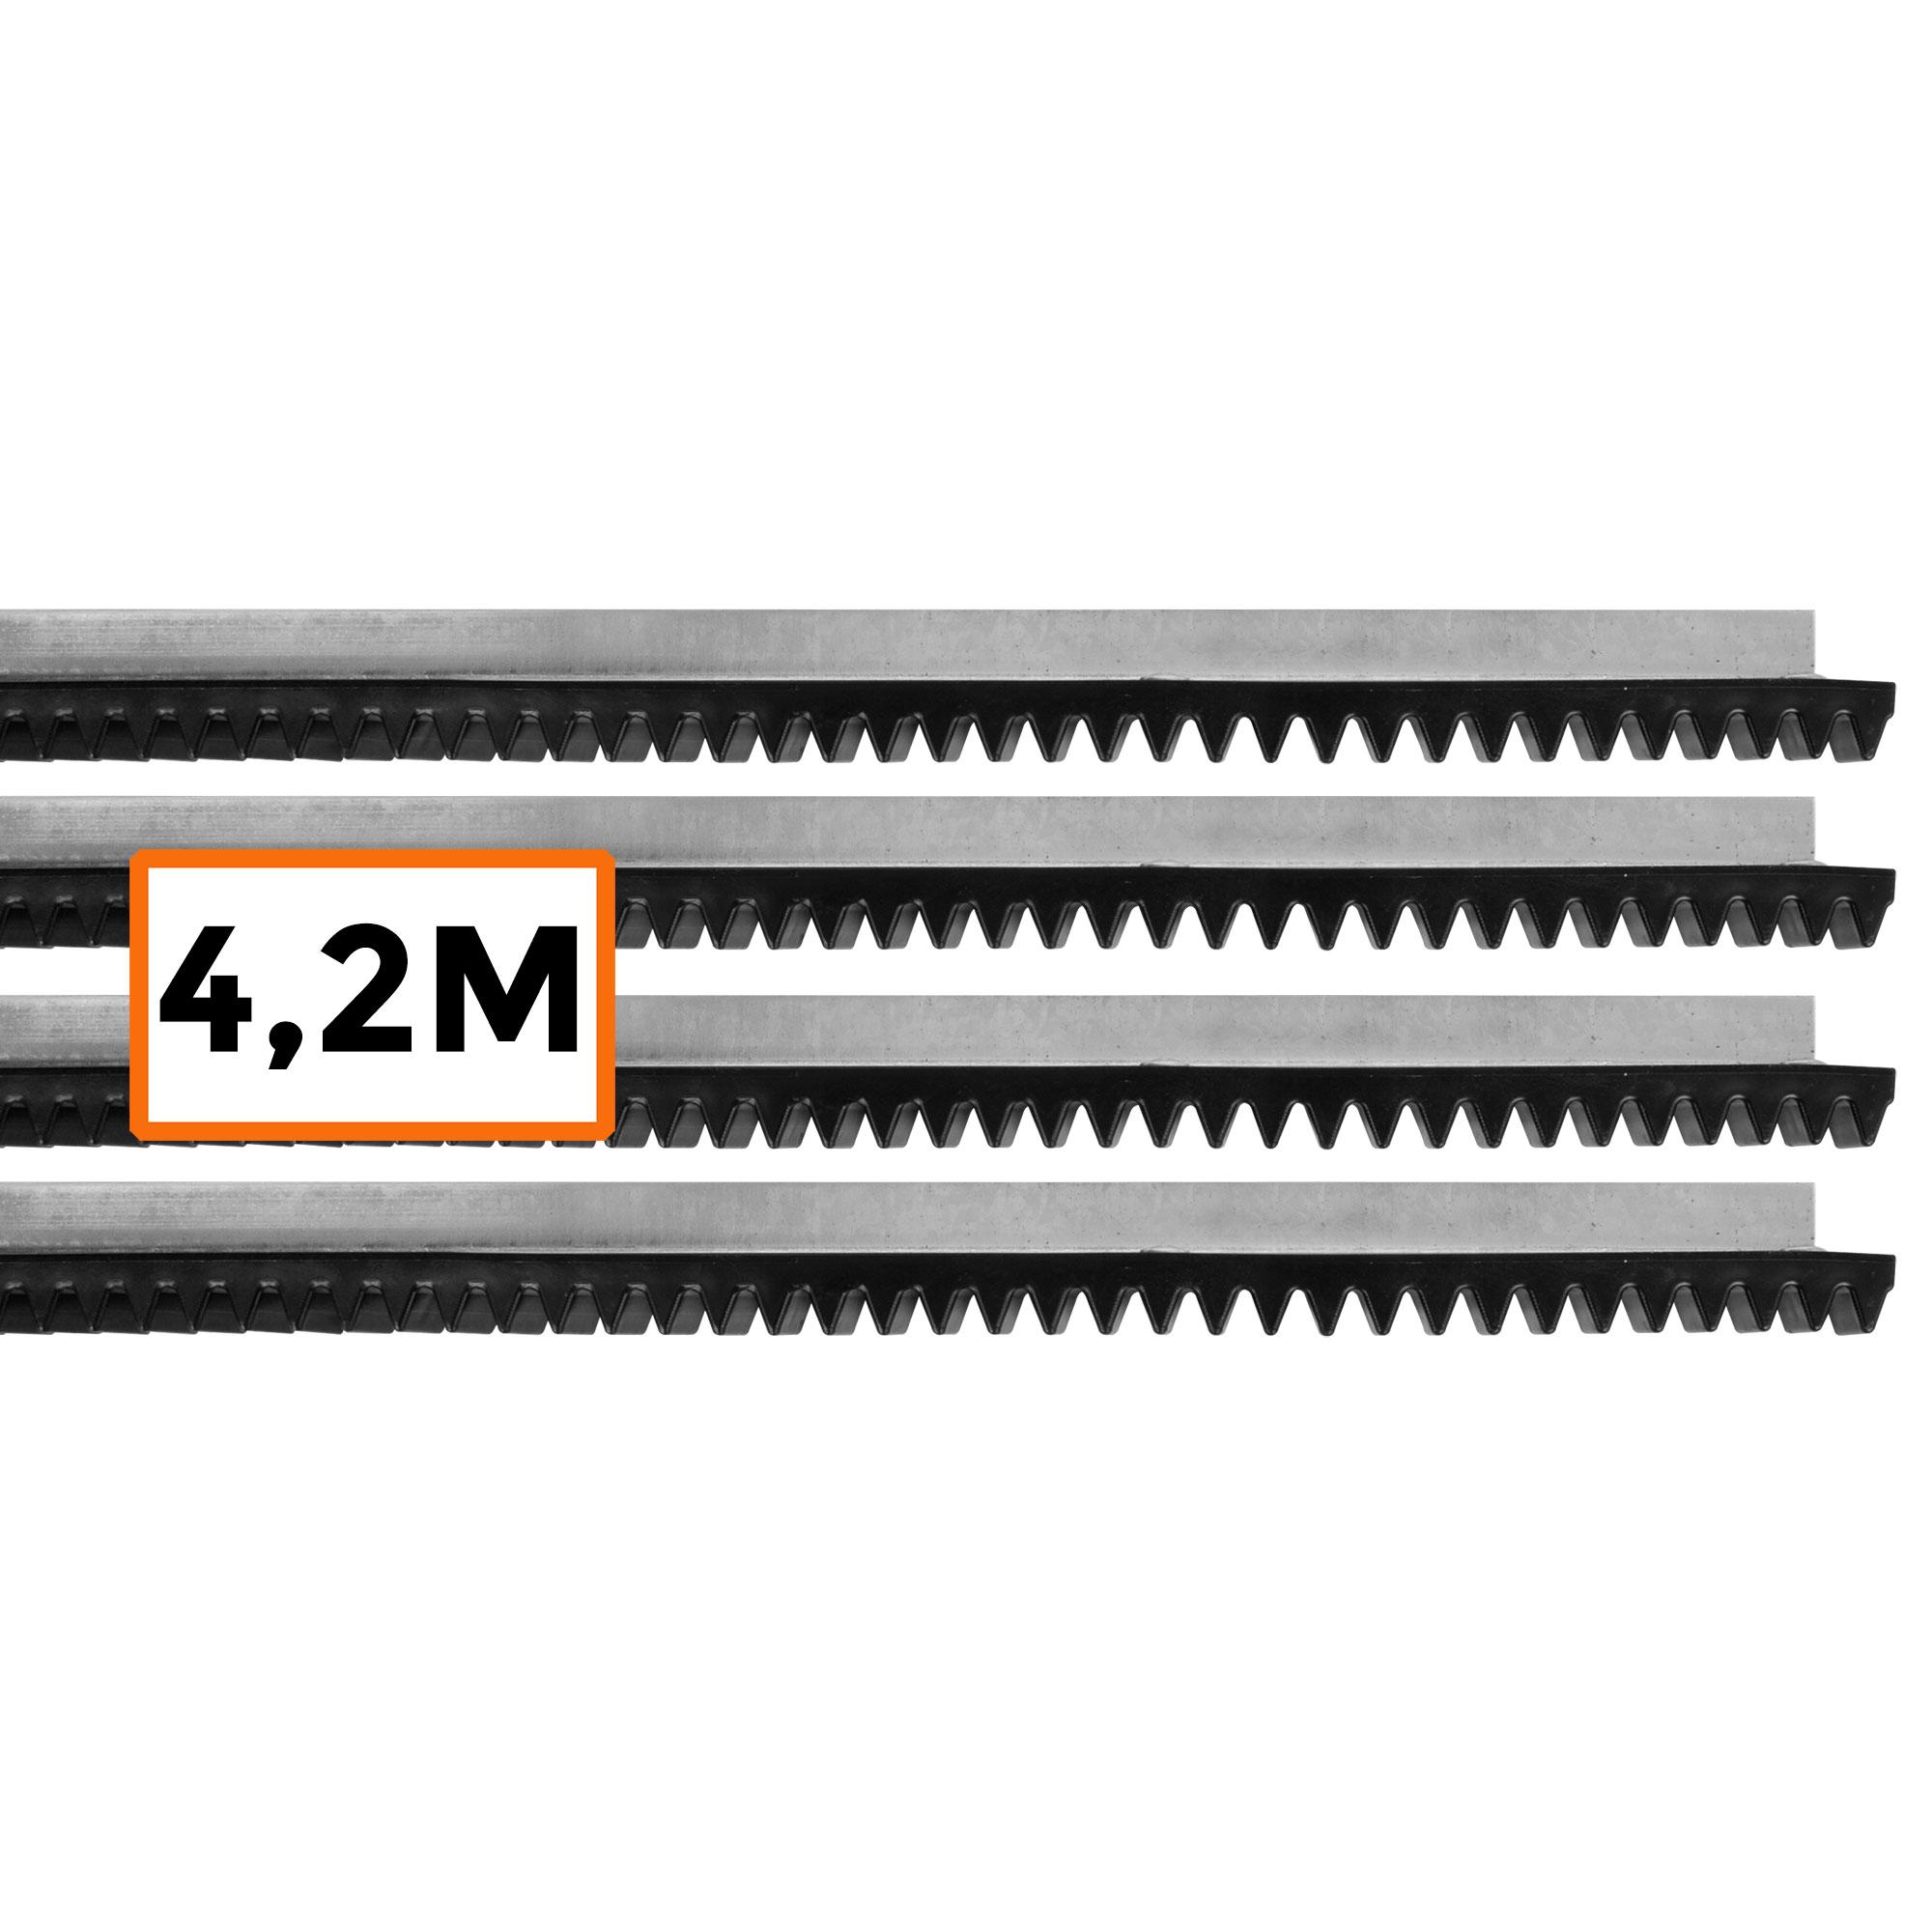 Kit 4,2 Metros Cremalheira Residencial Deslizante Motor Portão Universal